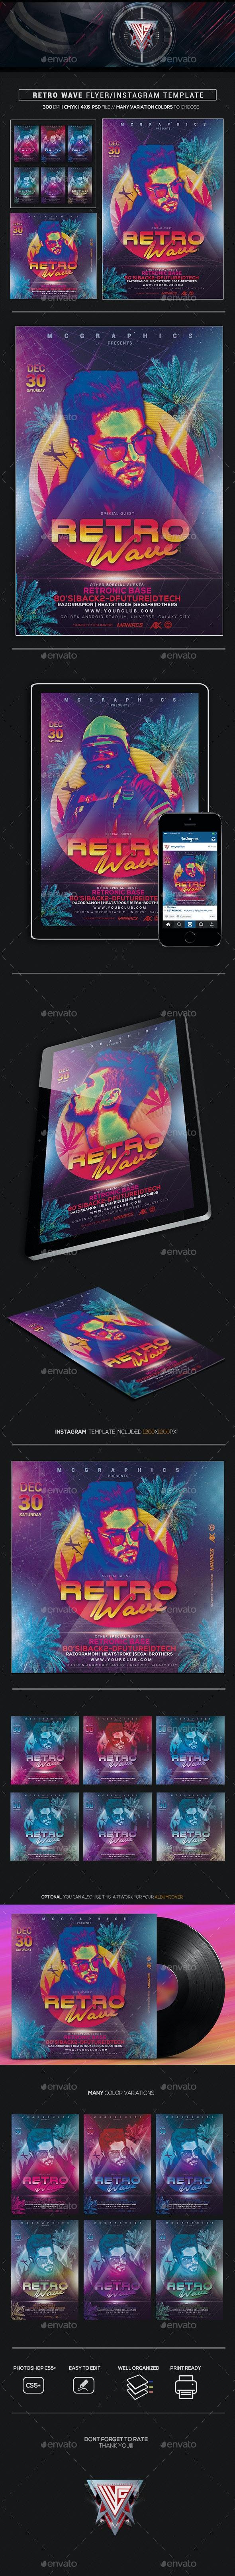 Retro Wave Flyer/Instagram Template - Flyers Print Templates